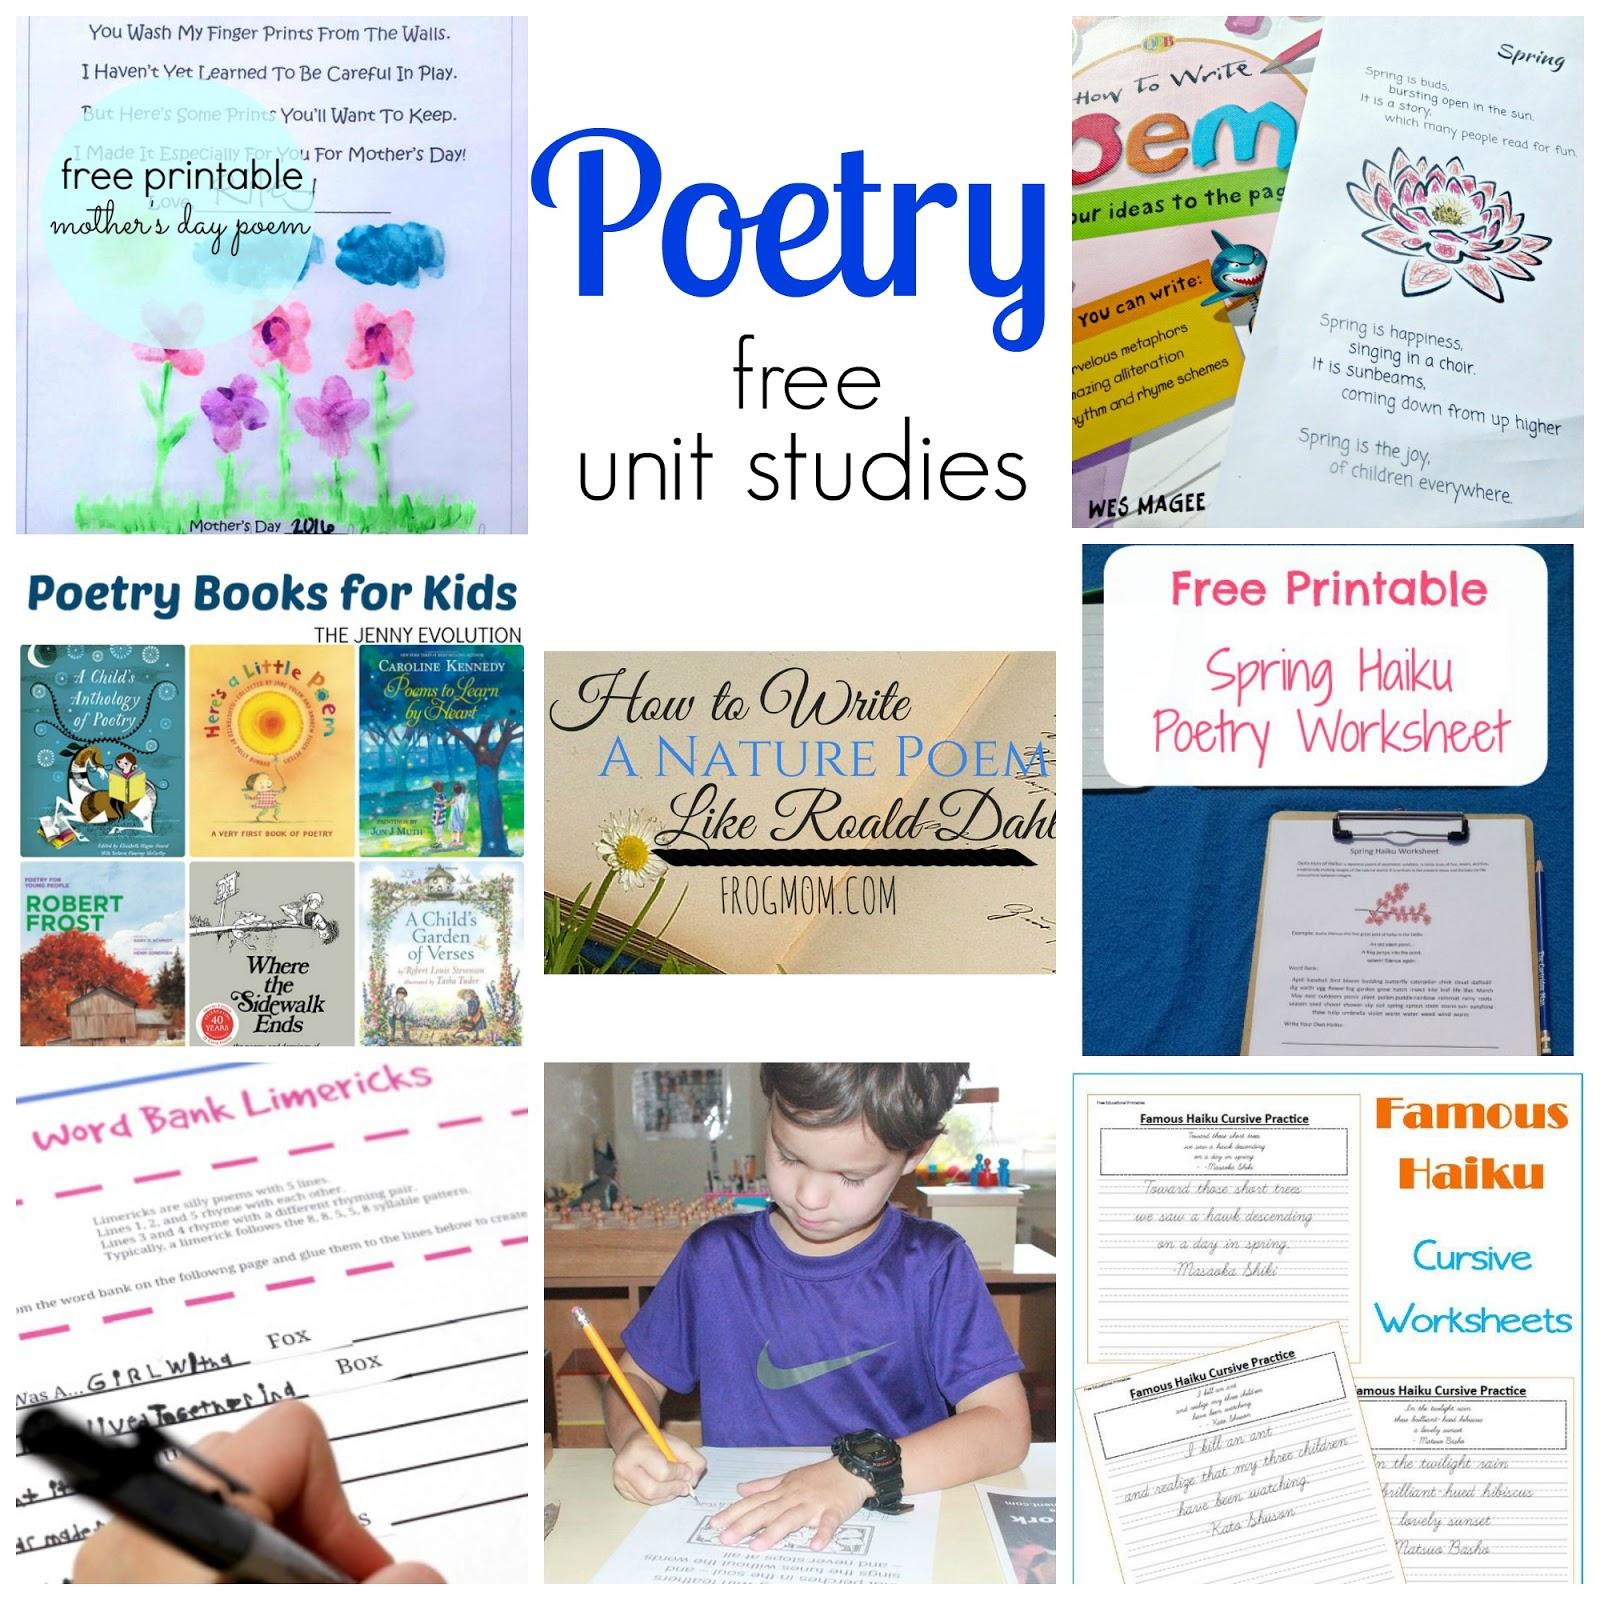 Poetry Writing For Kids Using Metaphors